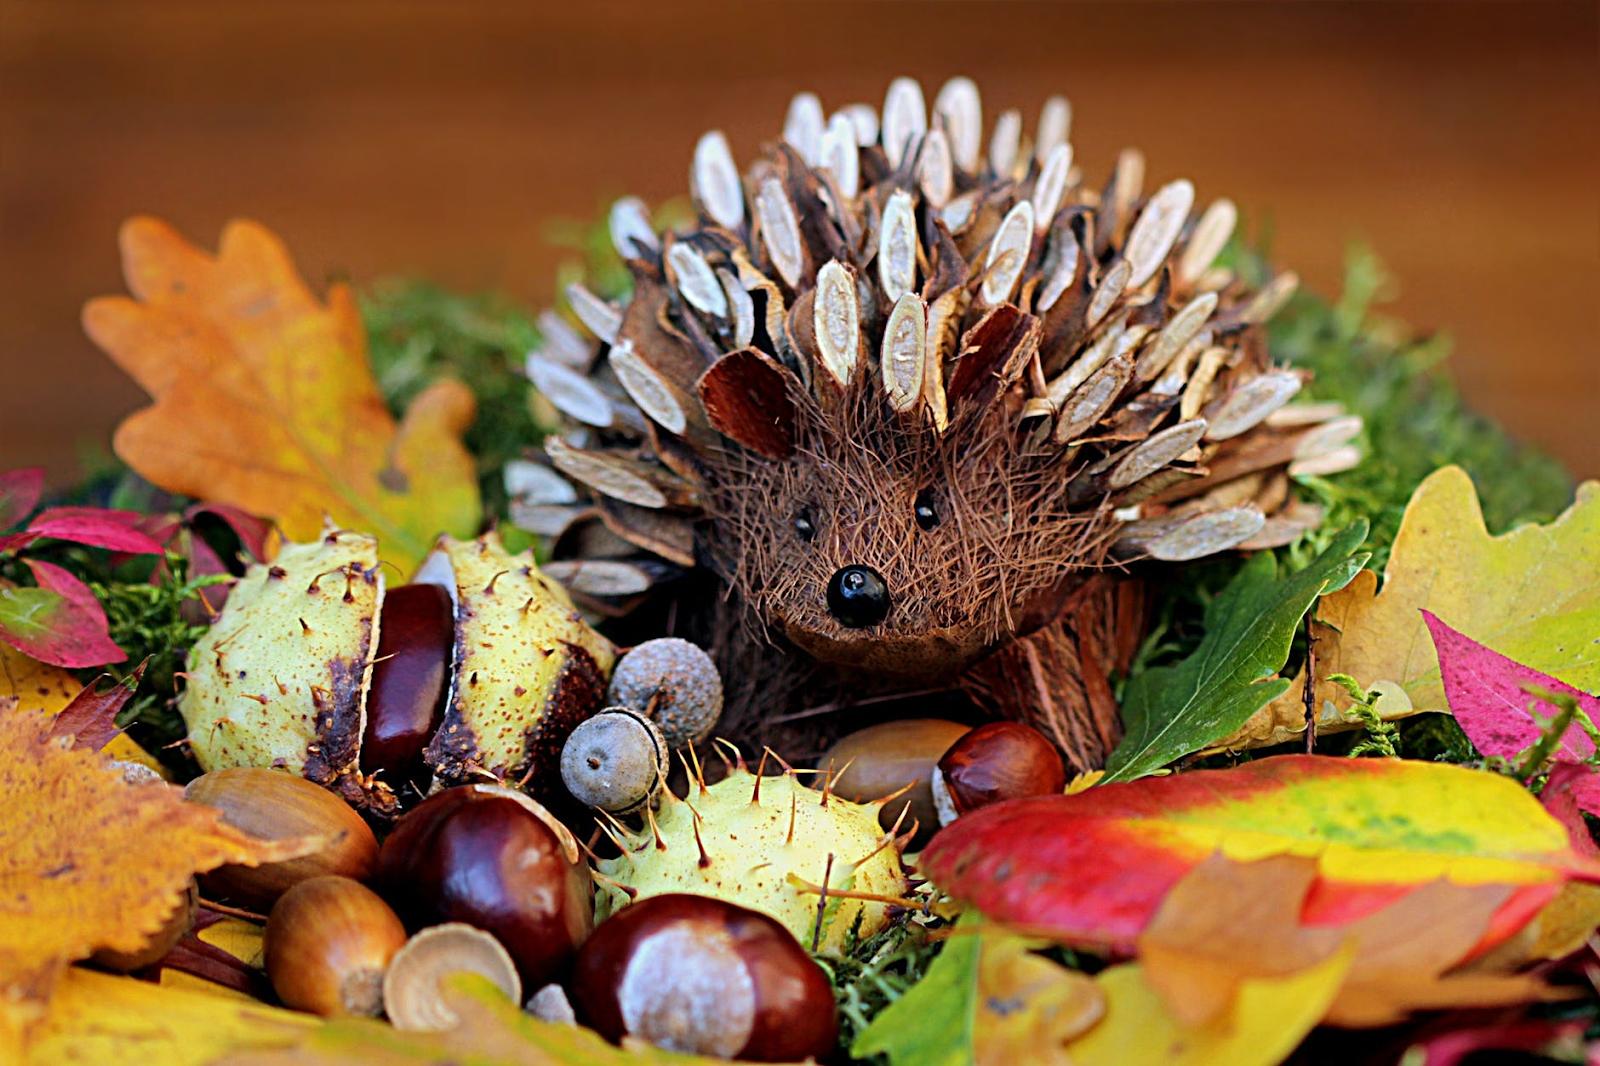 decorative hedgehog on fall leaves